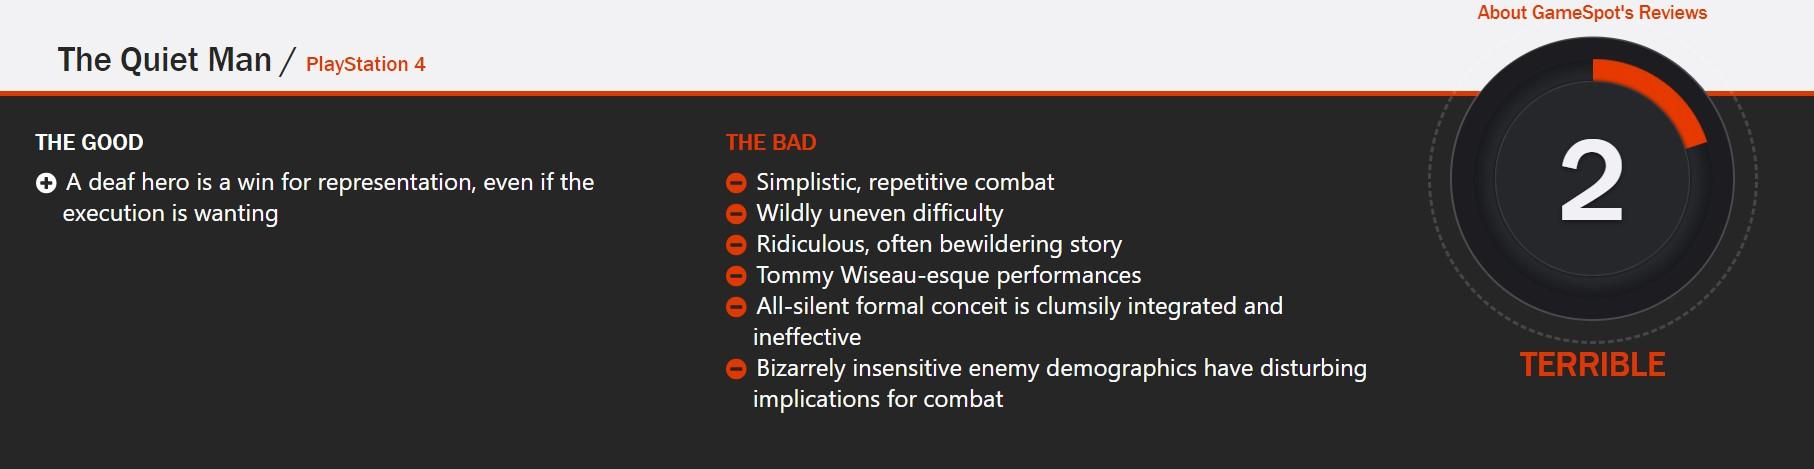 SE新IP《沉默之人》扑街:Game Spot 2分 IGN 5.5分